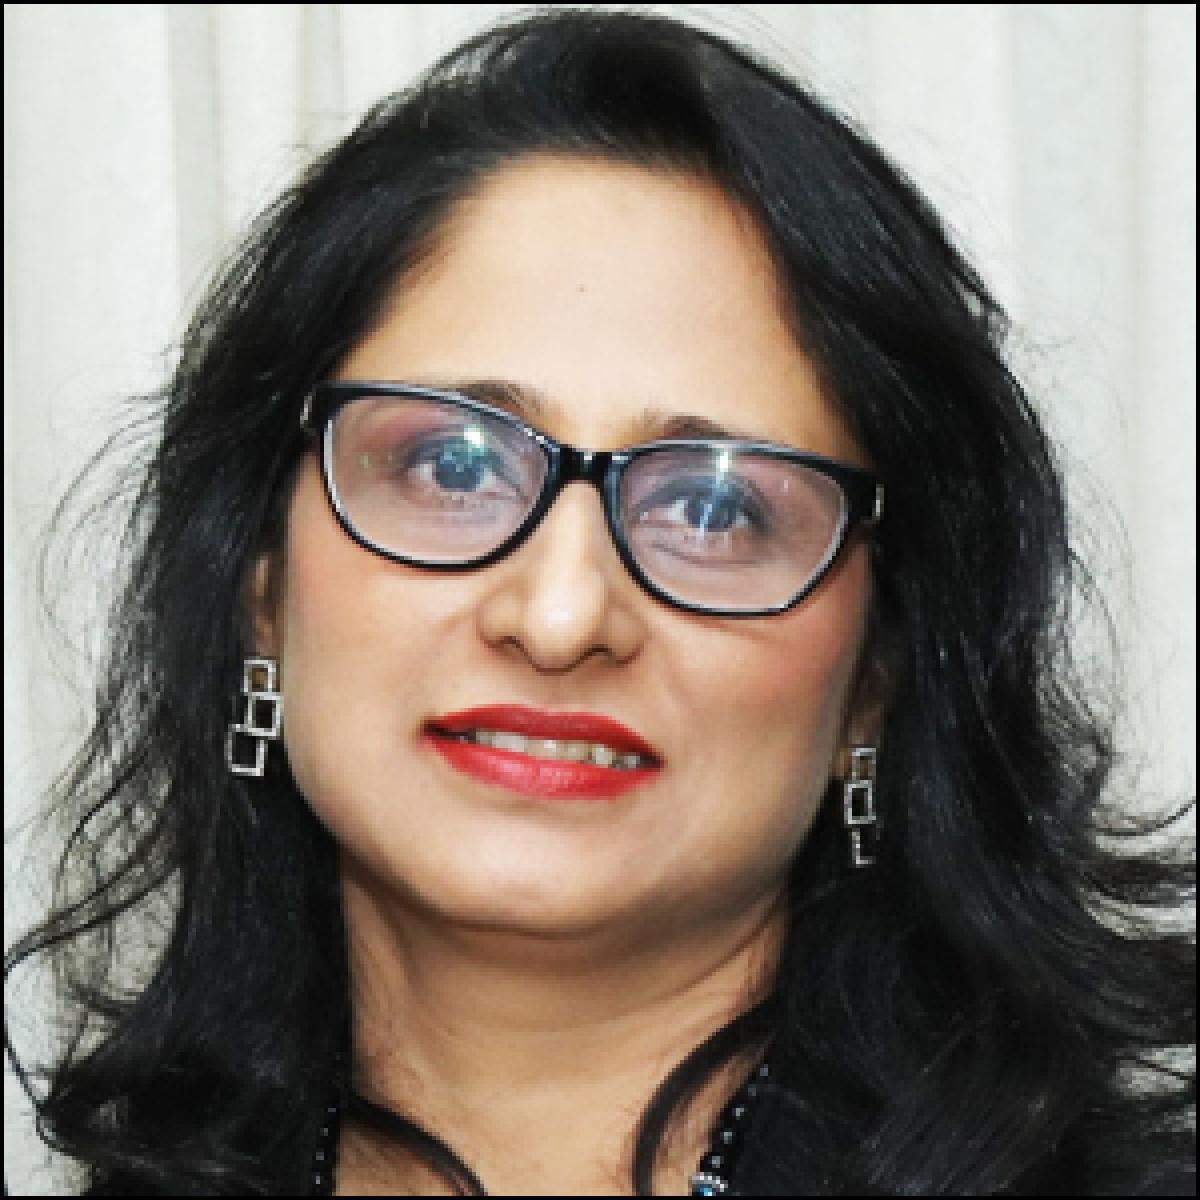 Lokmat's Shalini Gupta joins Inox as VP - brand and communication (marketing)